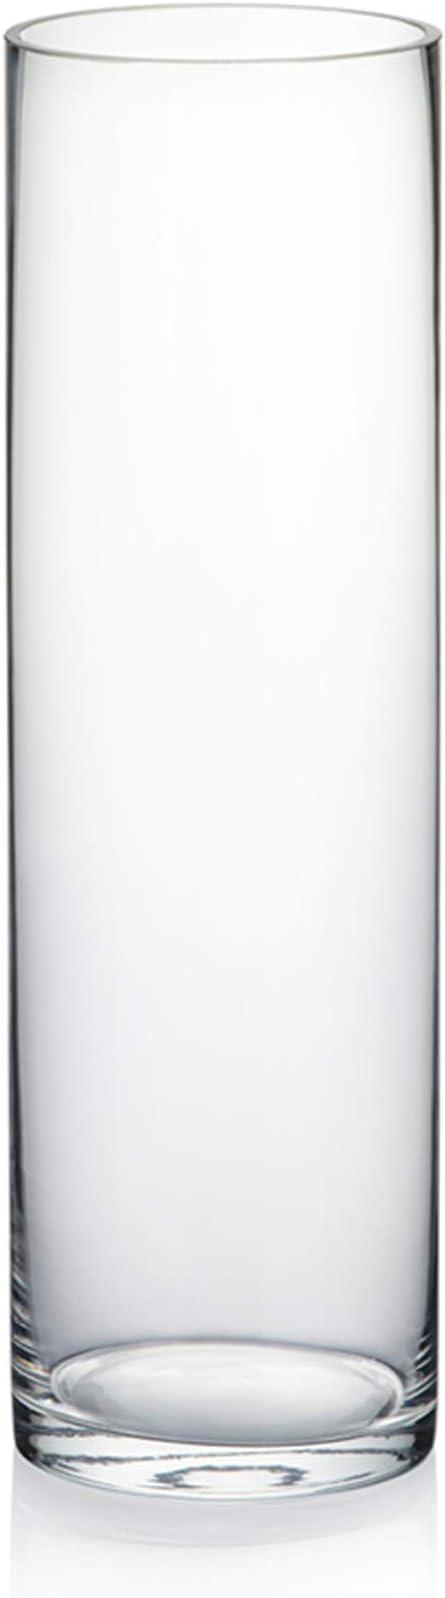 dekoglas 10cm 10x10cm Transparent hakbijl Tealight Holder Vase Dice Cube H